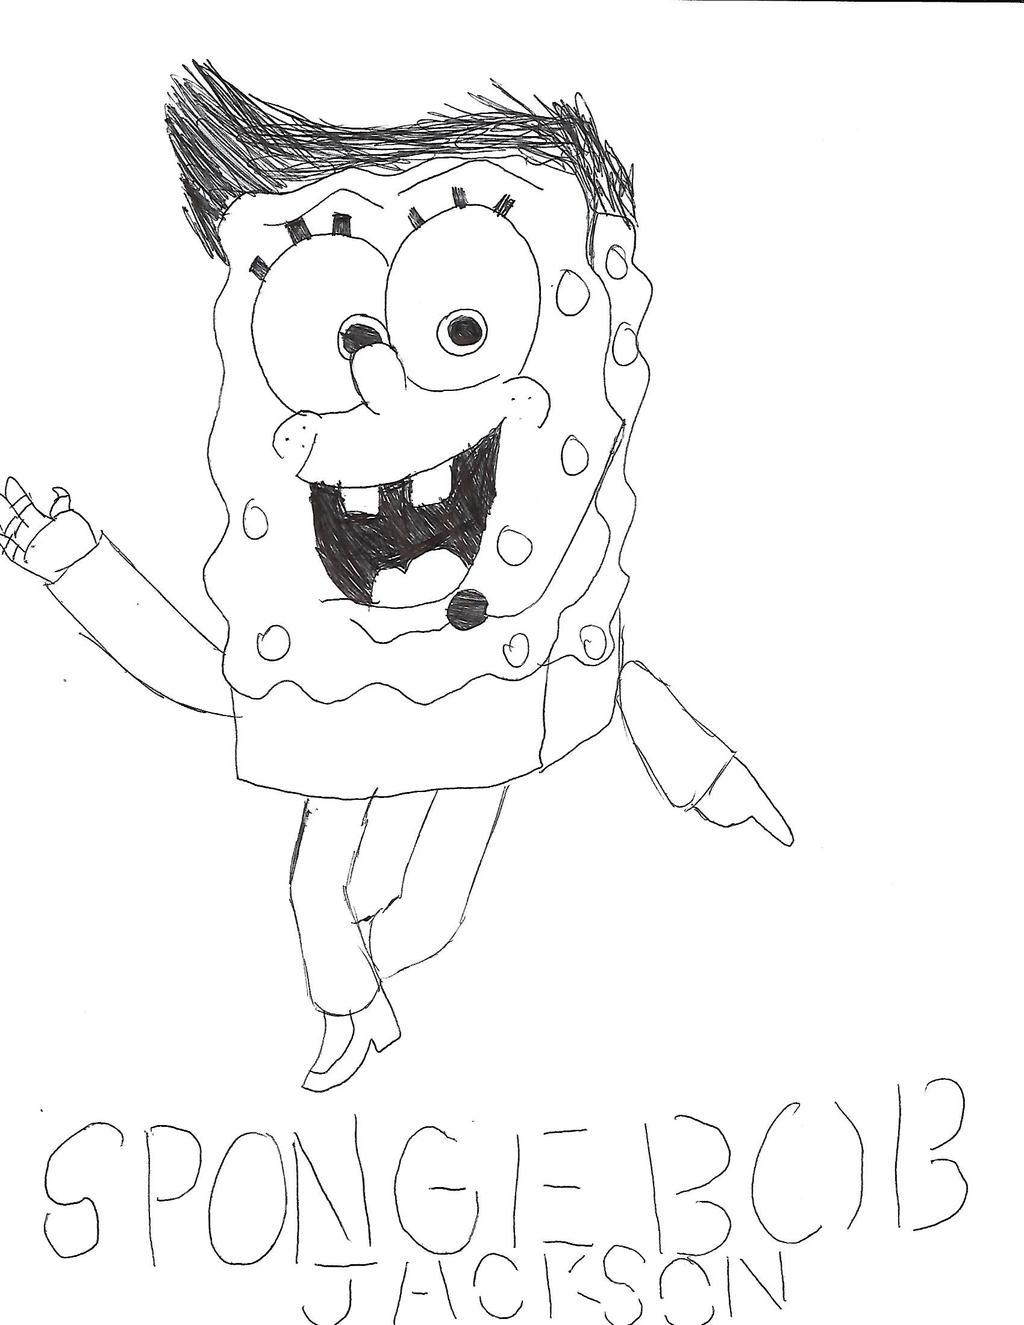 SpongeBob Jackson Badge